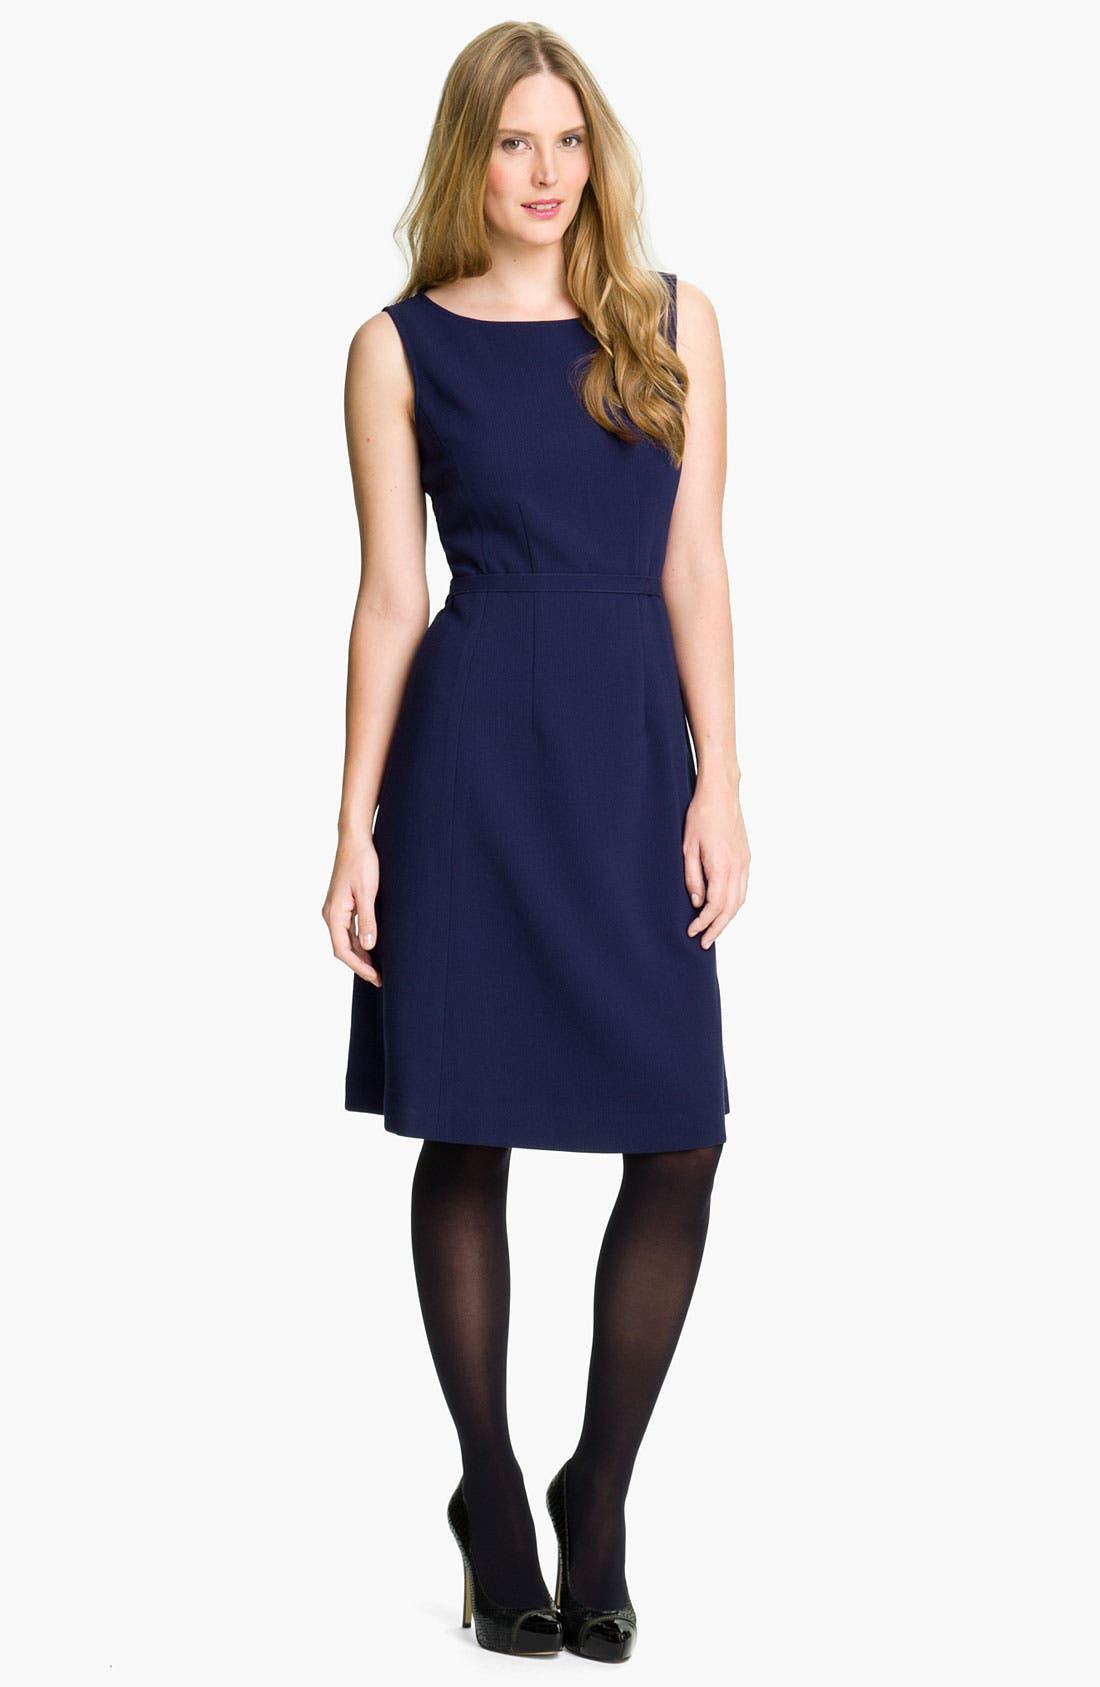 Alternate Image 1 Selected - Lafayette 148 New York Double Cloth Bateau Neck Dress